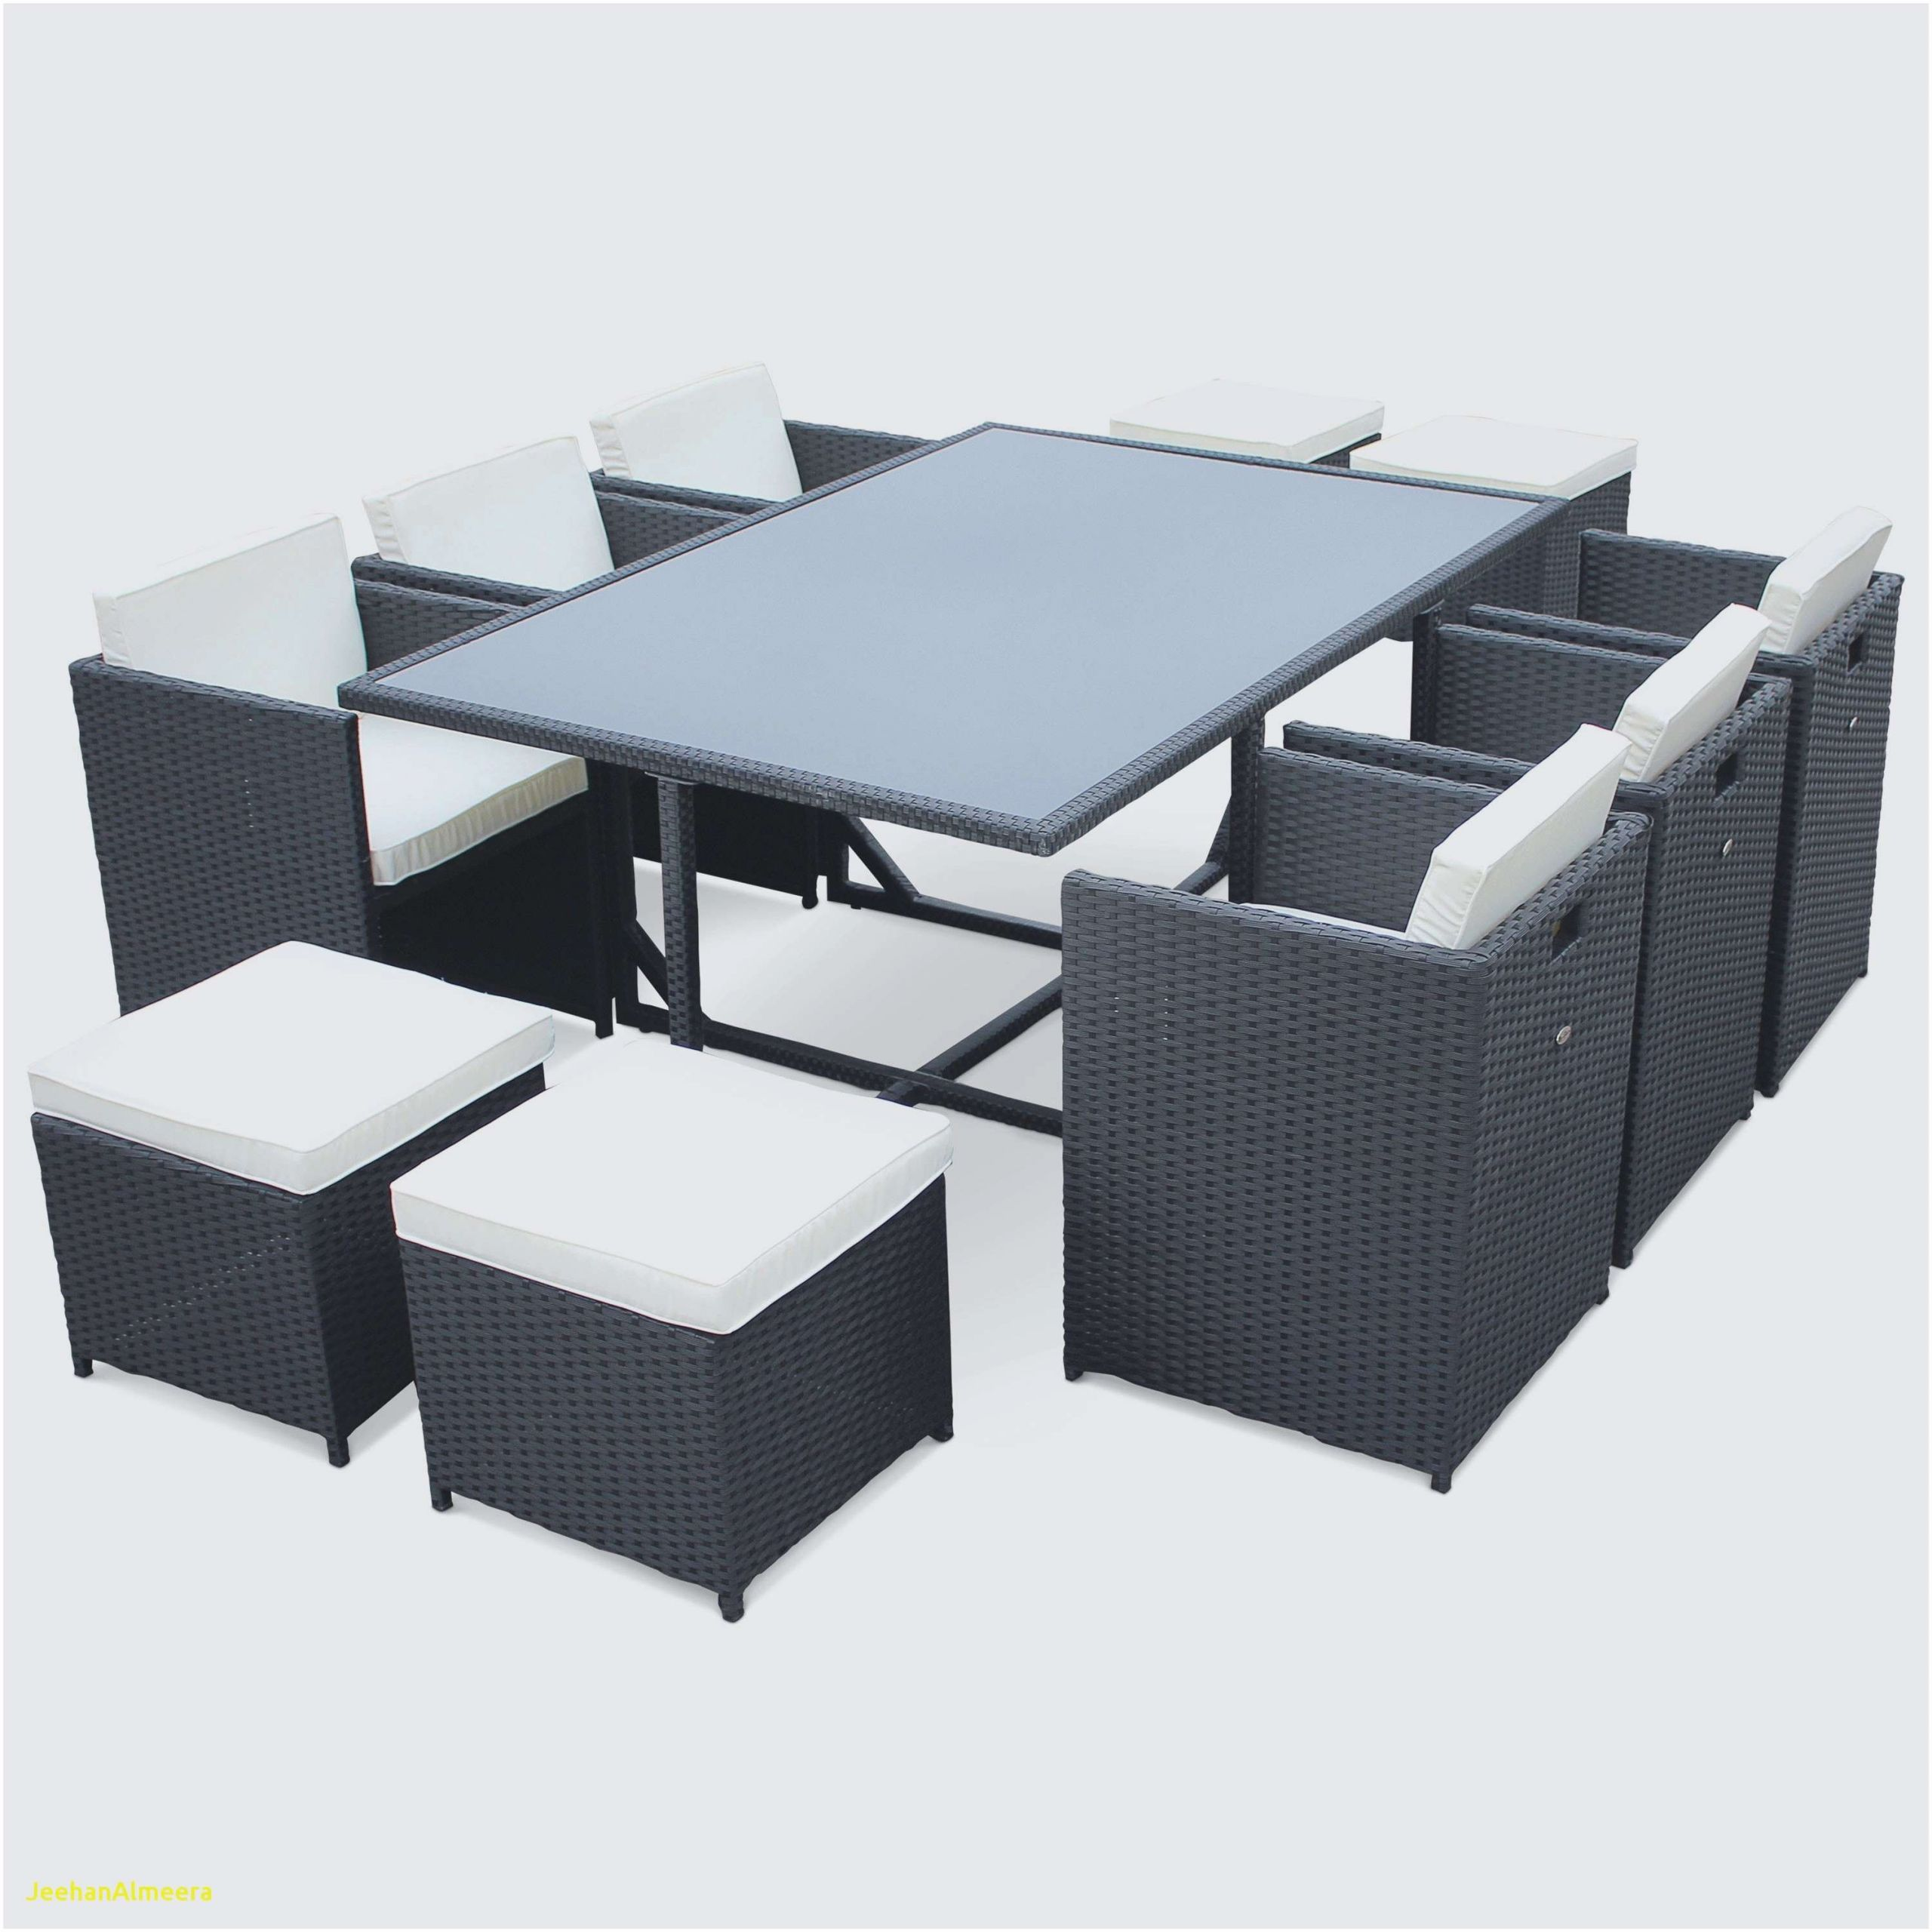 table de jardin grosfillex unique salon de jardin leroy merlin 2017 beau stock leroy merlin of table de jardin grosfillex